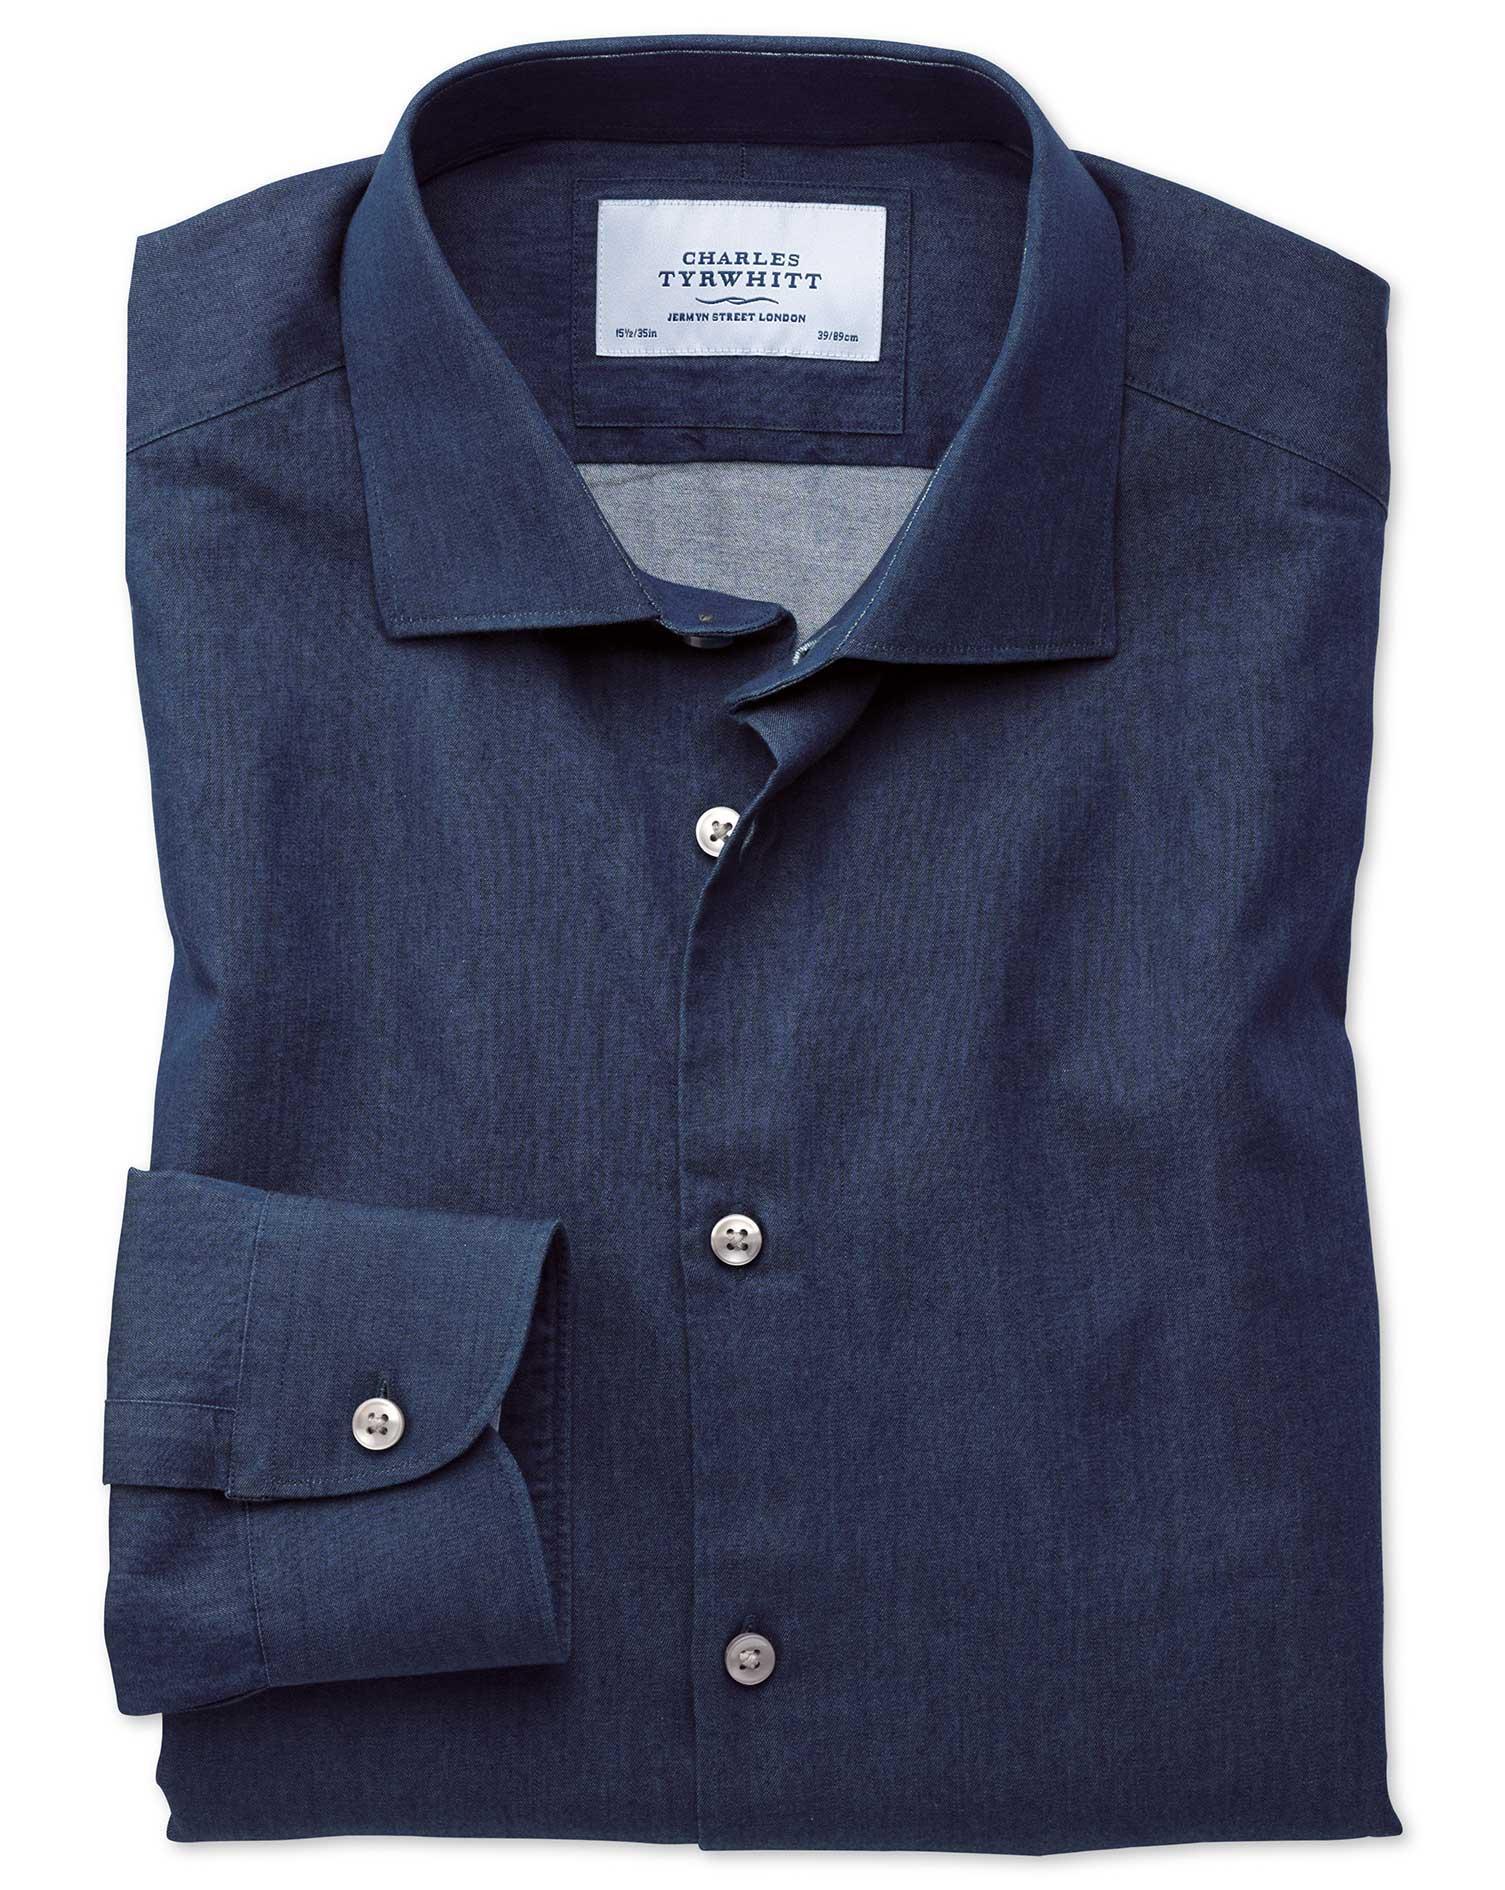 Extra Slim Fit Semi Spread Collar Business Casual Indigo Dark Blue Shirt